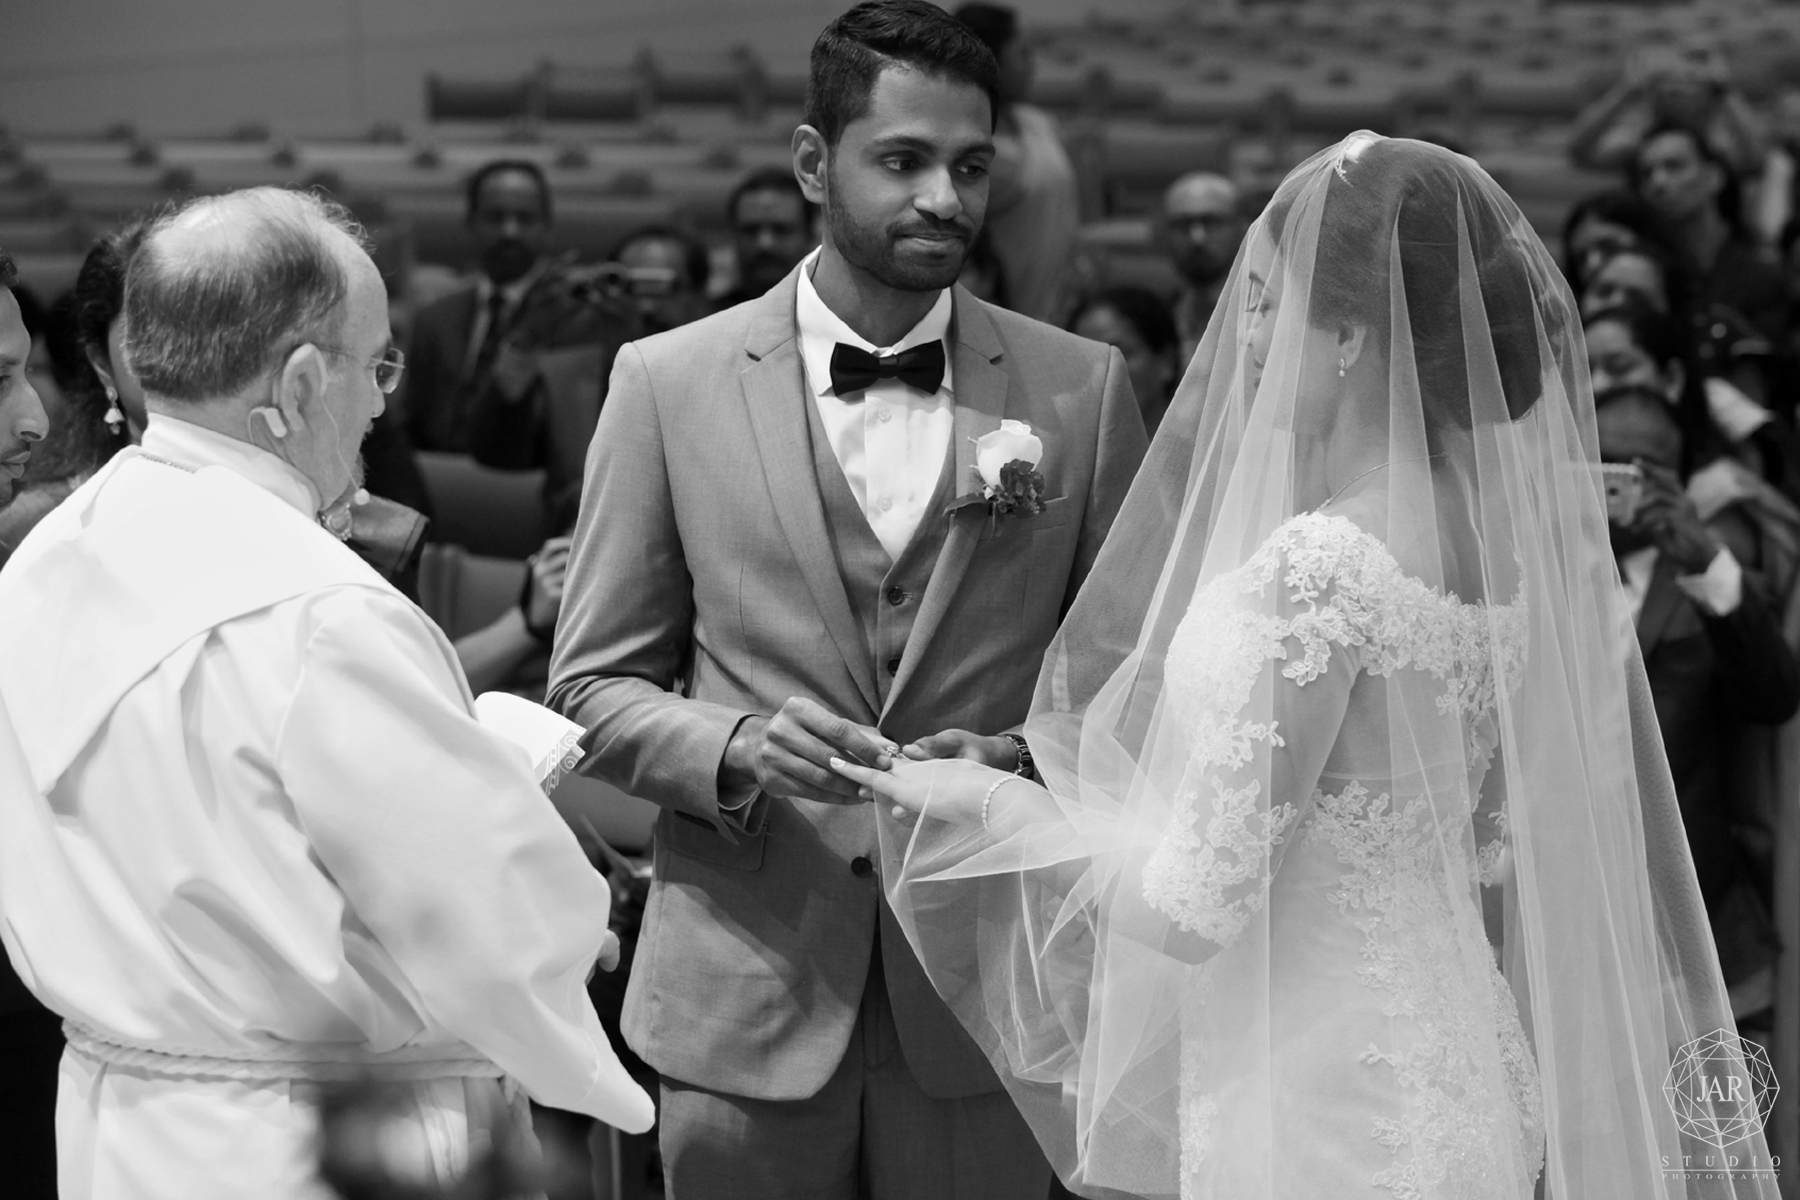 15-modern-indian-wedding-ceremony-jarstudio-photography.jpg